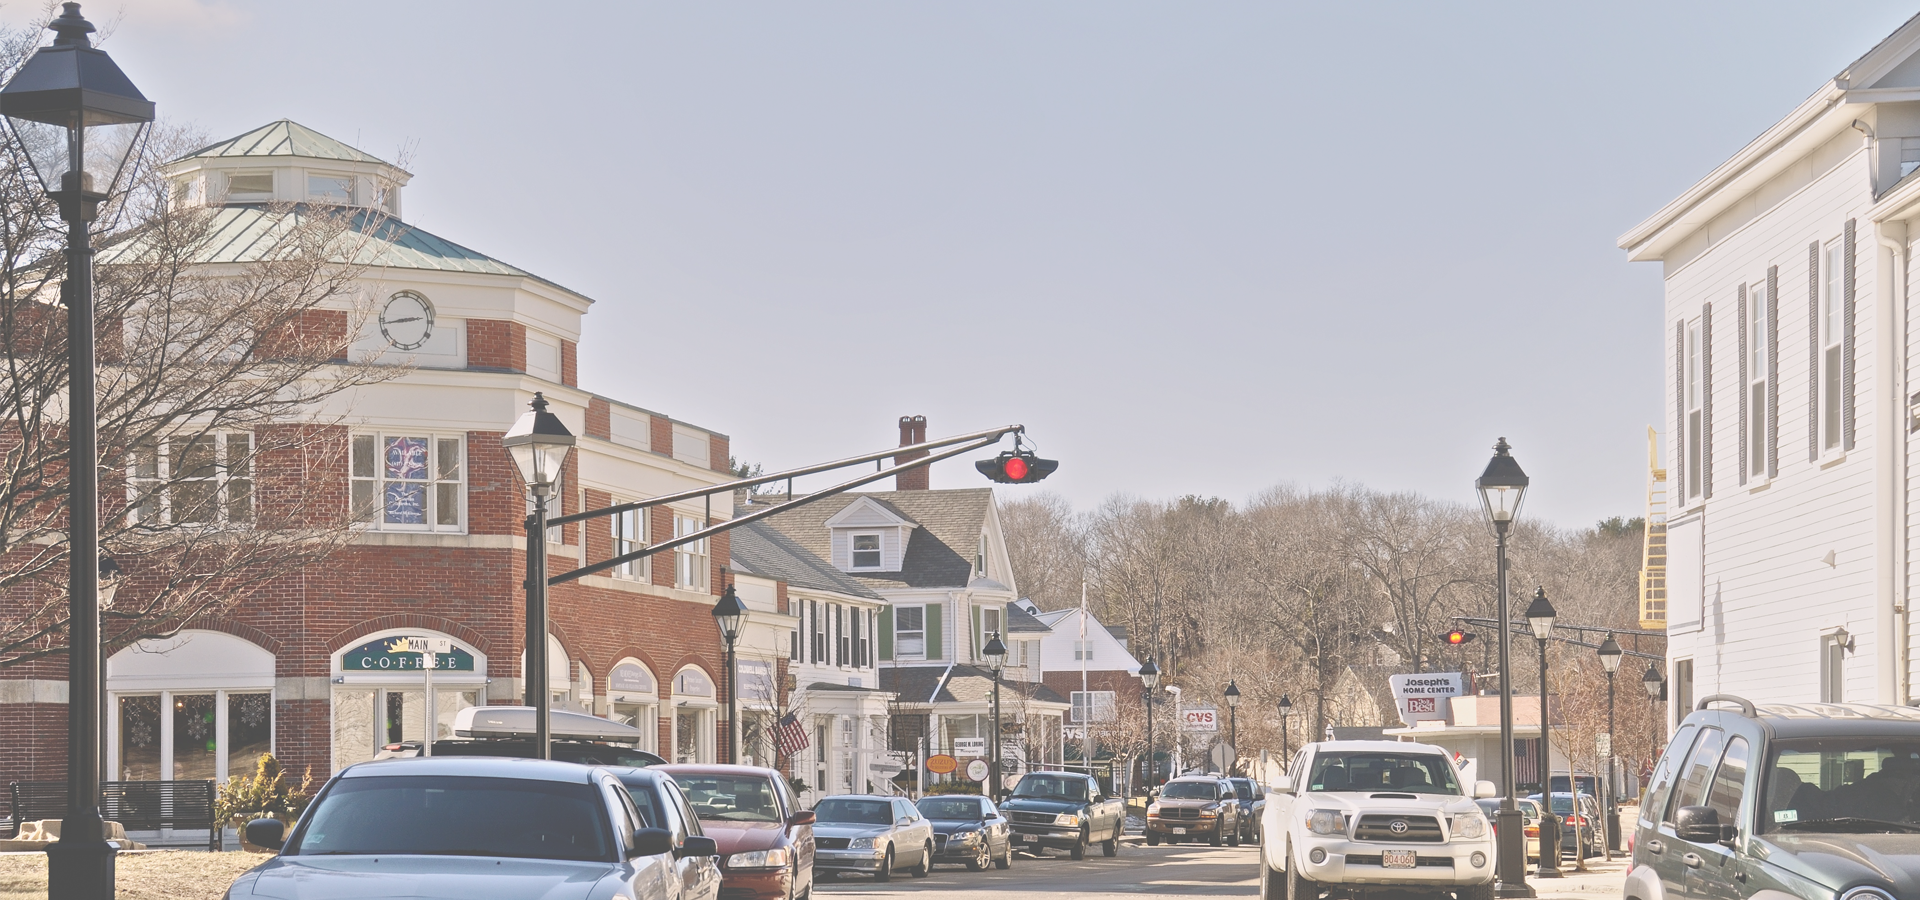 Hingham, Massachusetts, USA